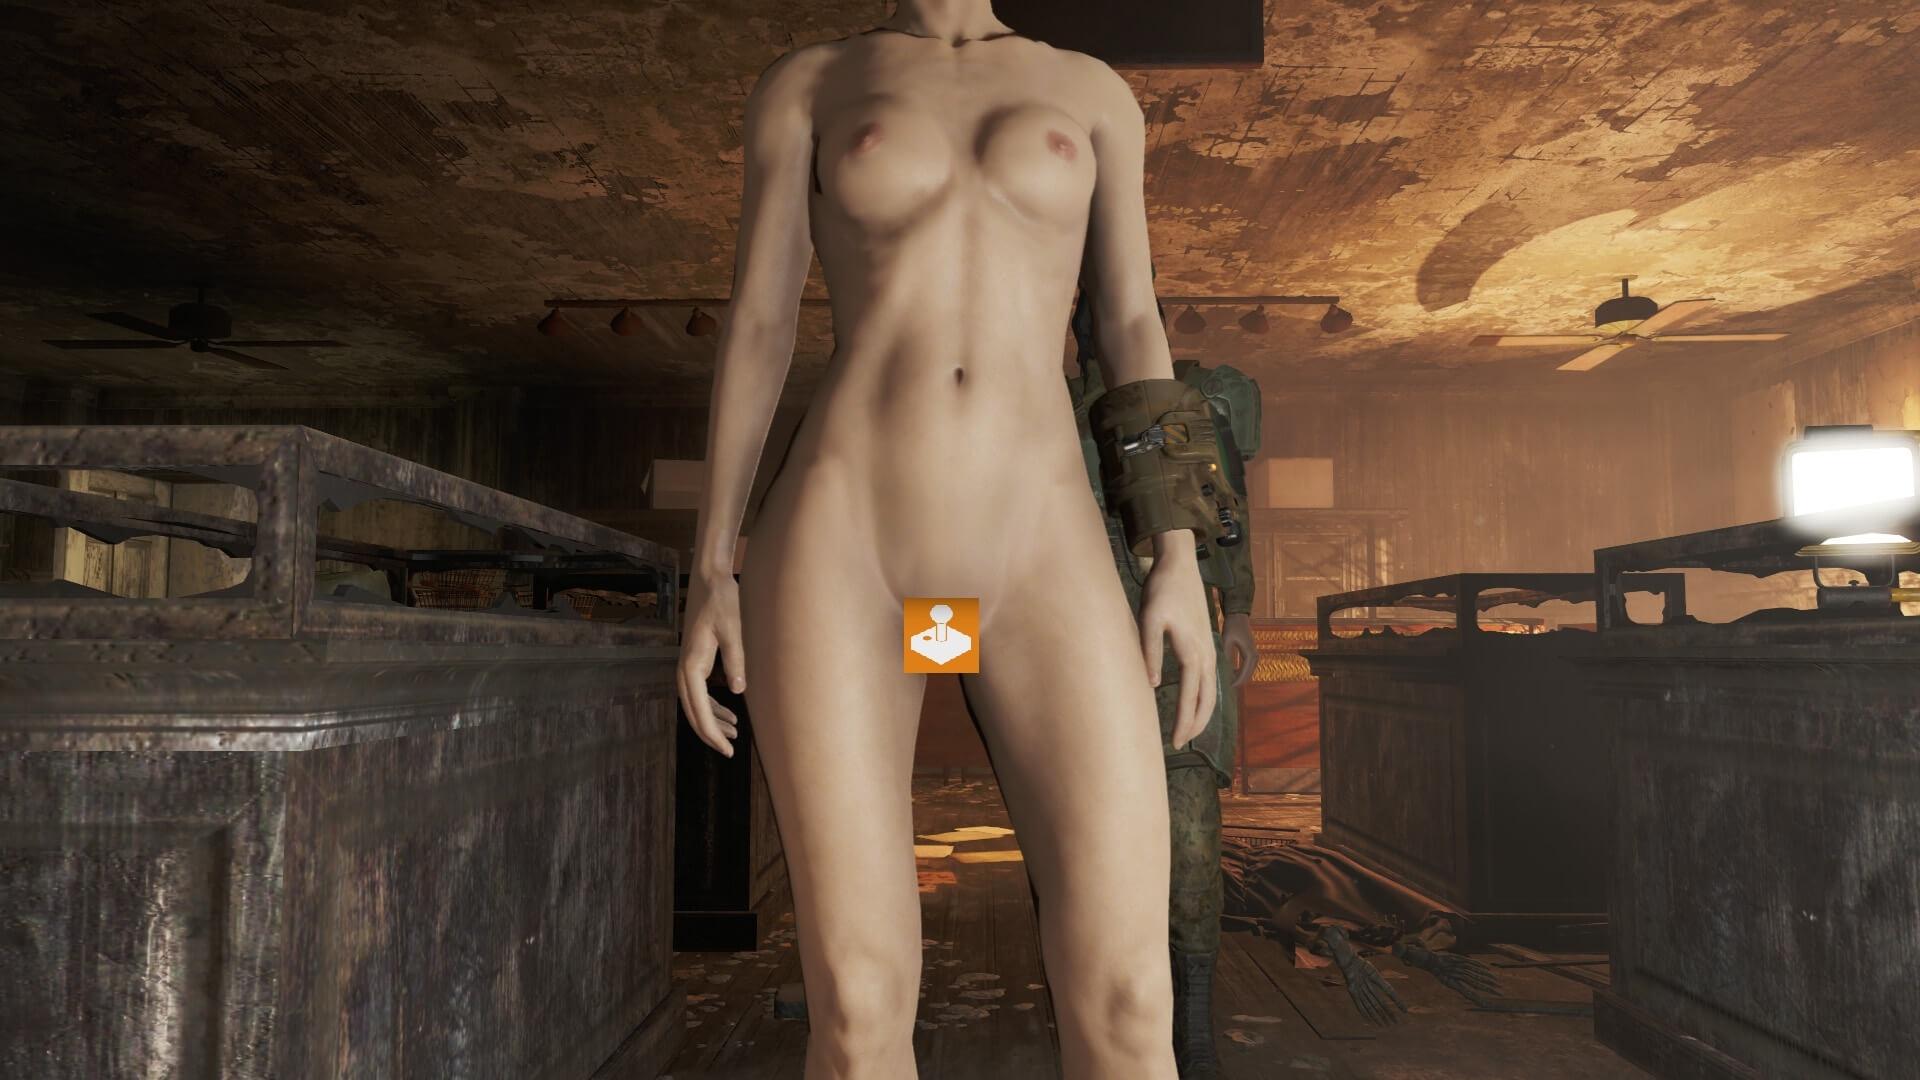 Fallout 3 female nude mods download pron tube